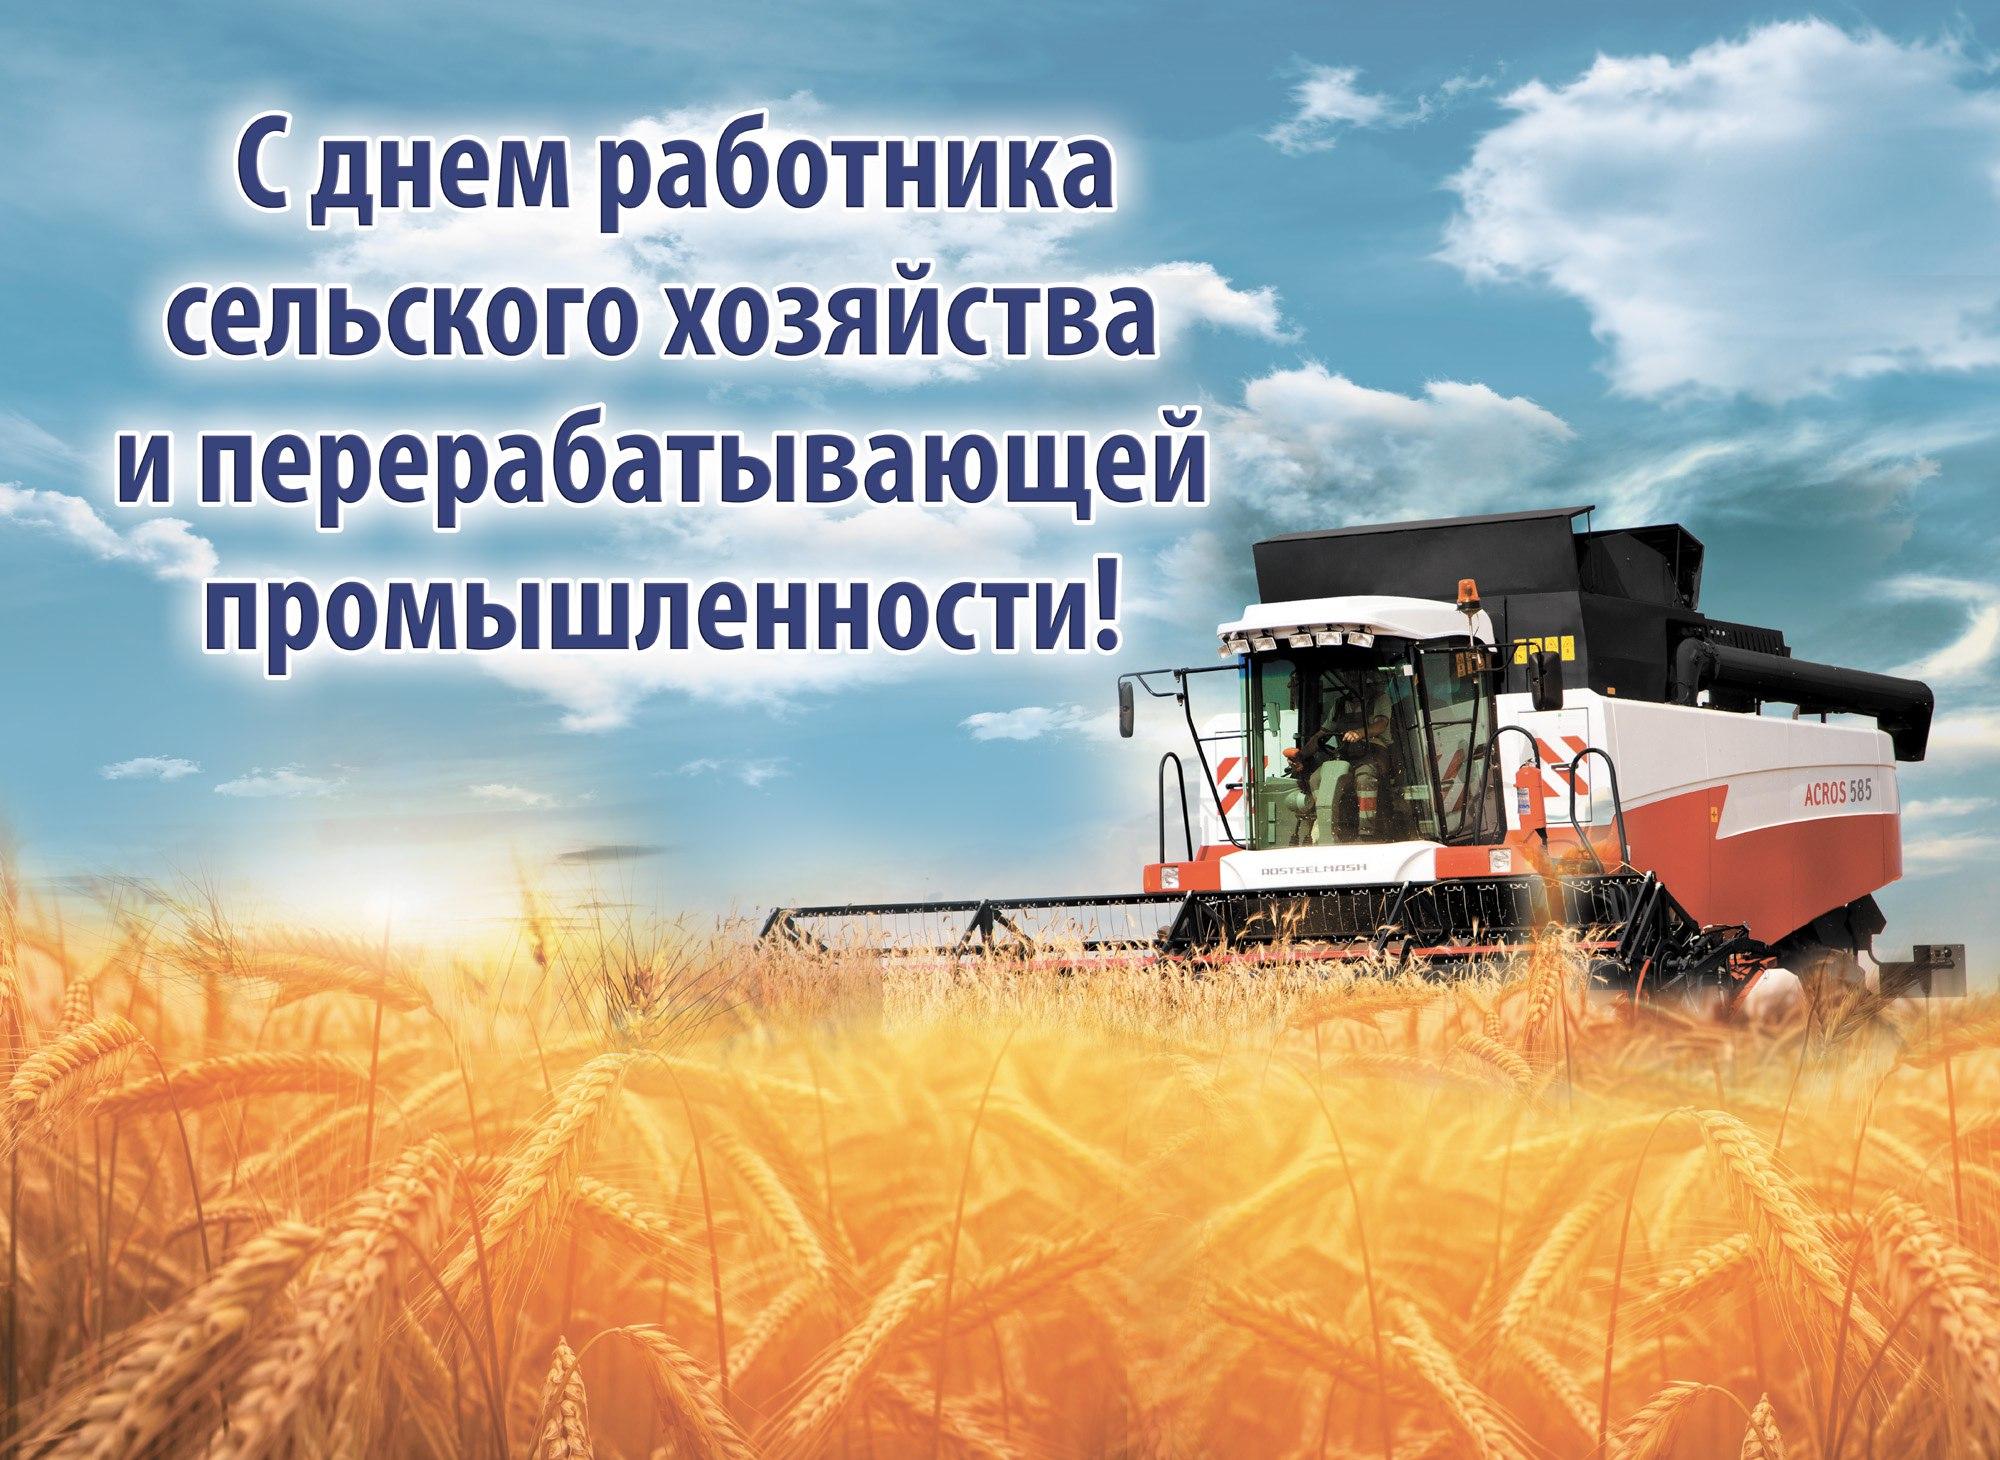 Сценарий празднования дня работника сельского хозяйства